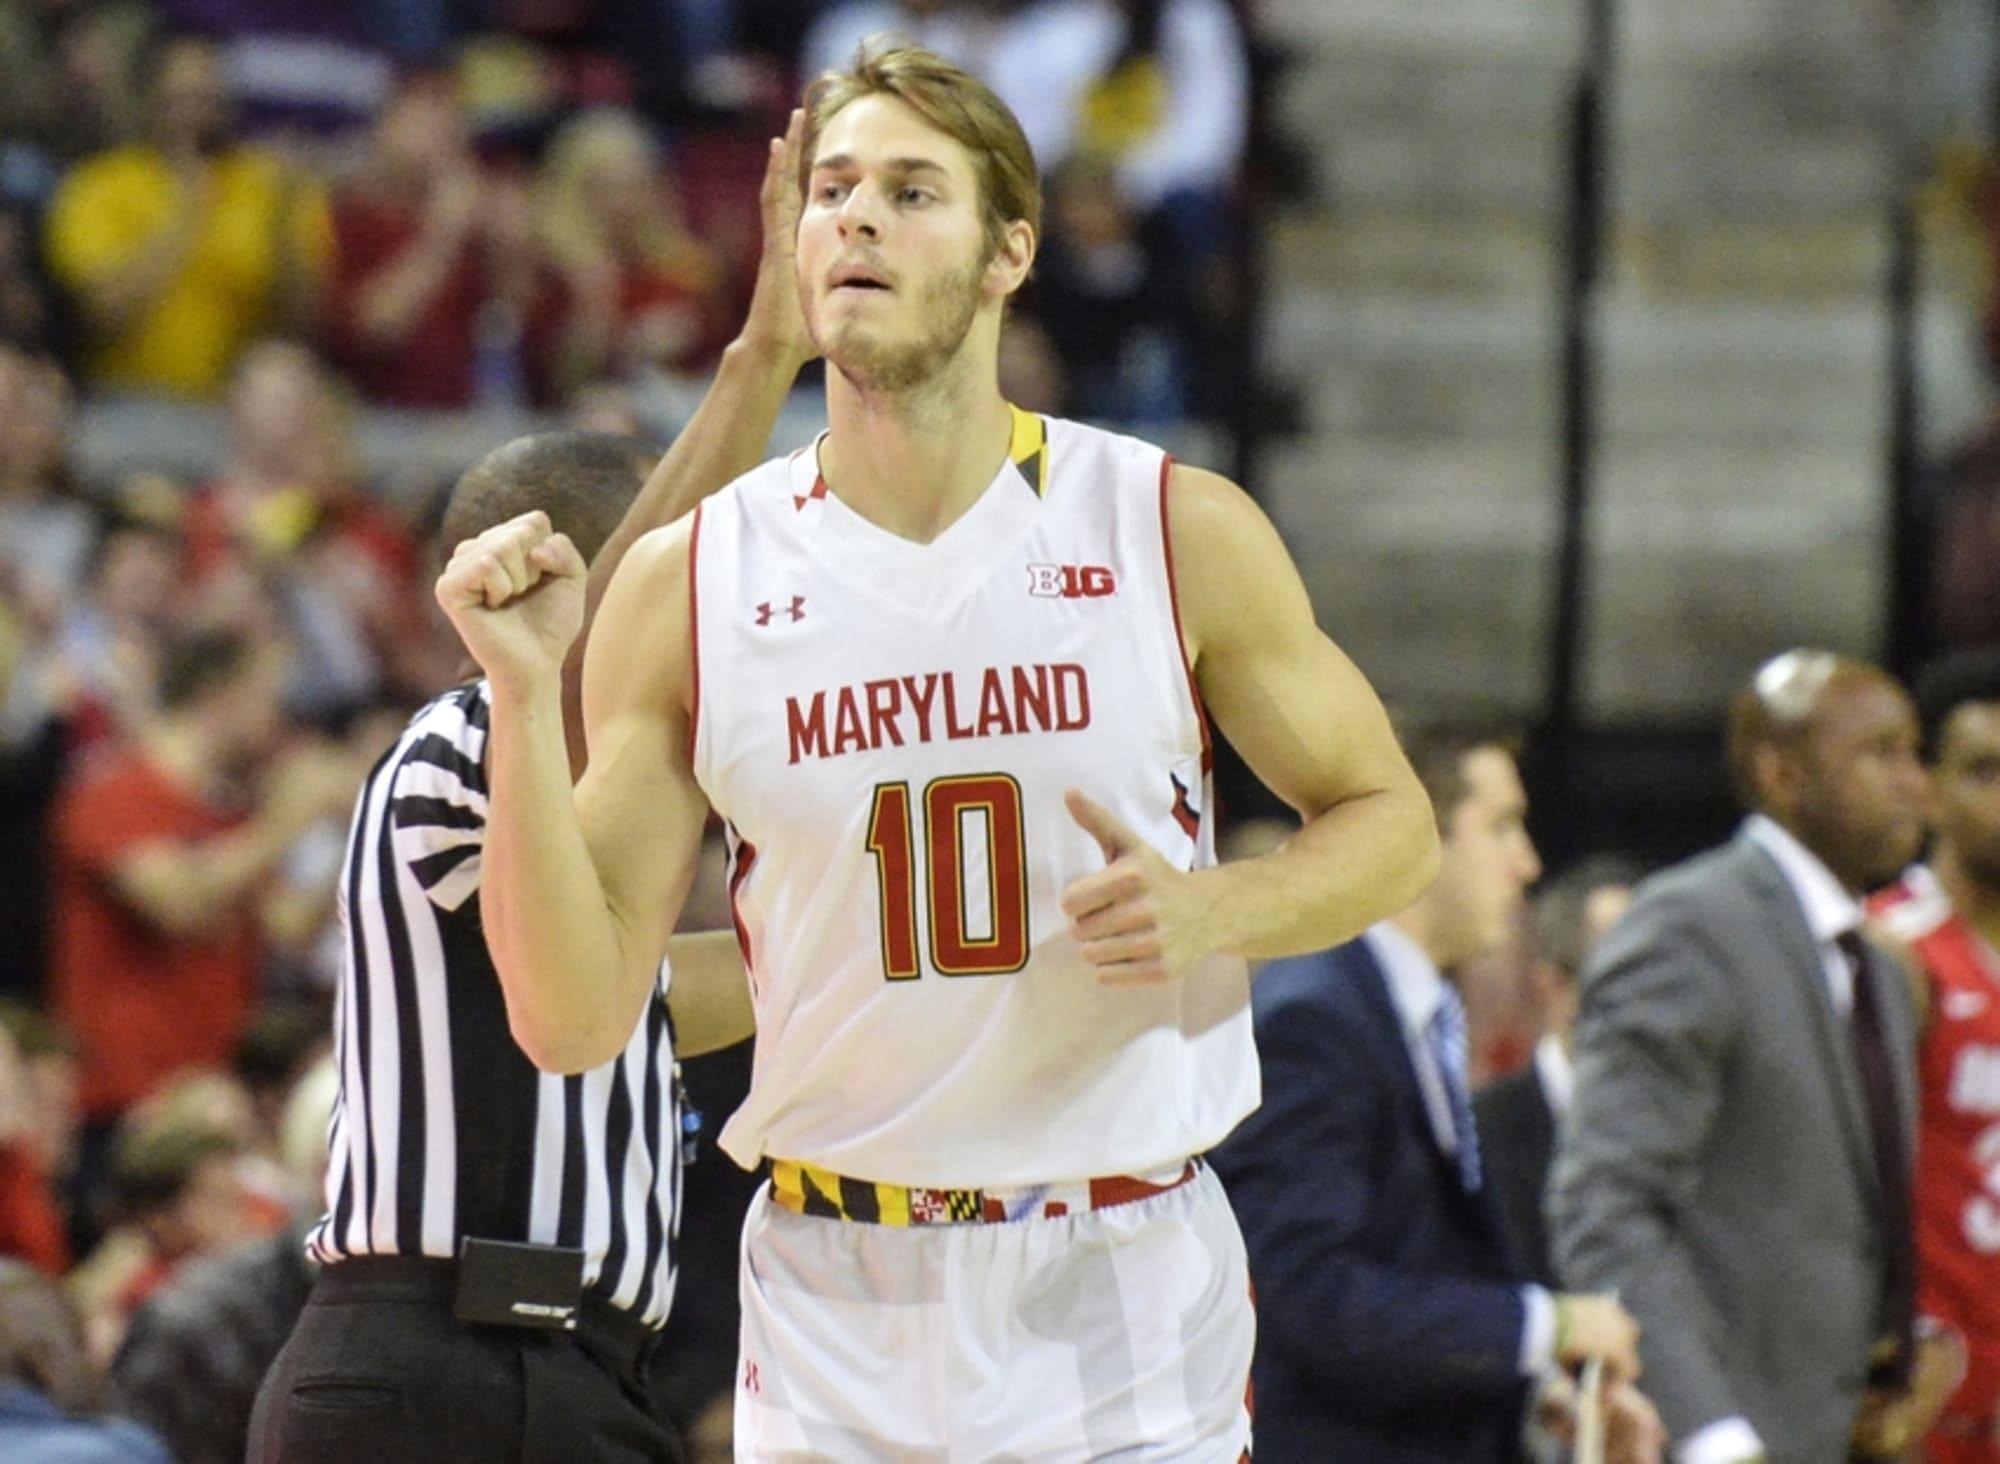 Pin By Md Minhajul Mamun On Soccer Players: Maryland Basketball: Jake Layman May Be Maryland's MVP